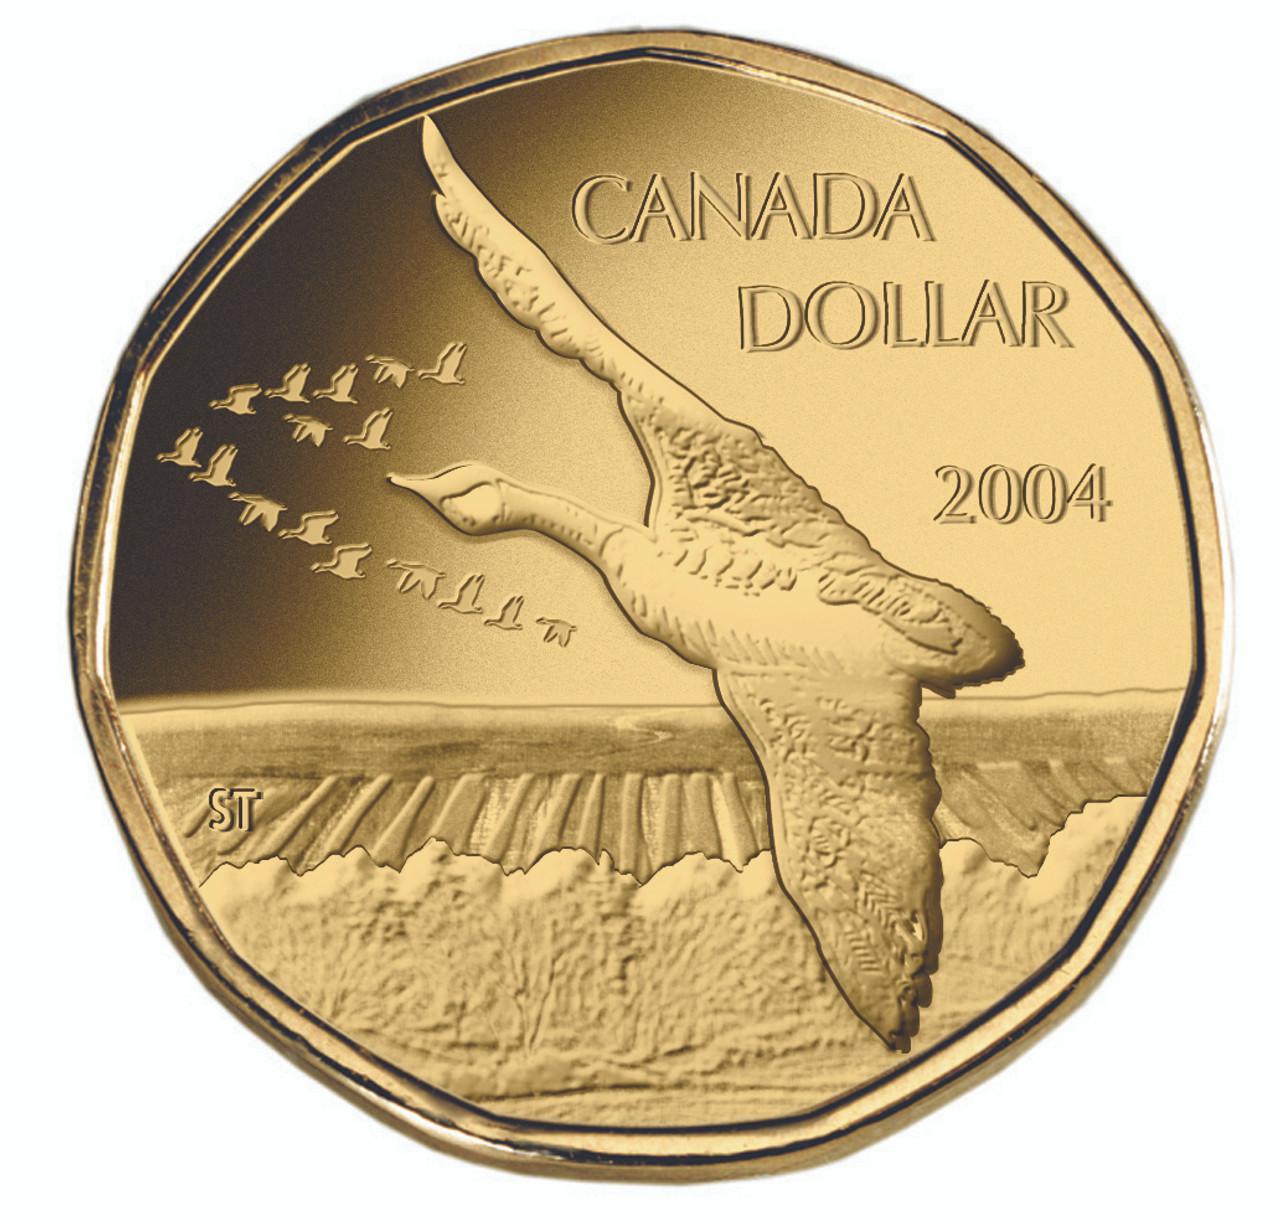 2004 Canada Specimen Loonie Dollar Elusive Loon